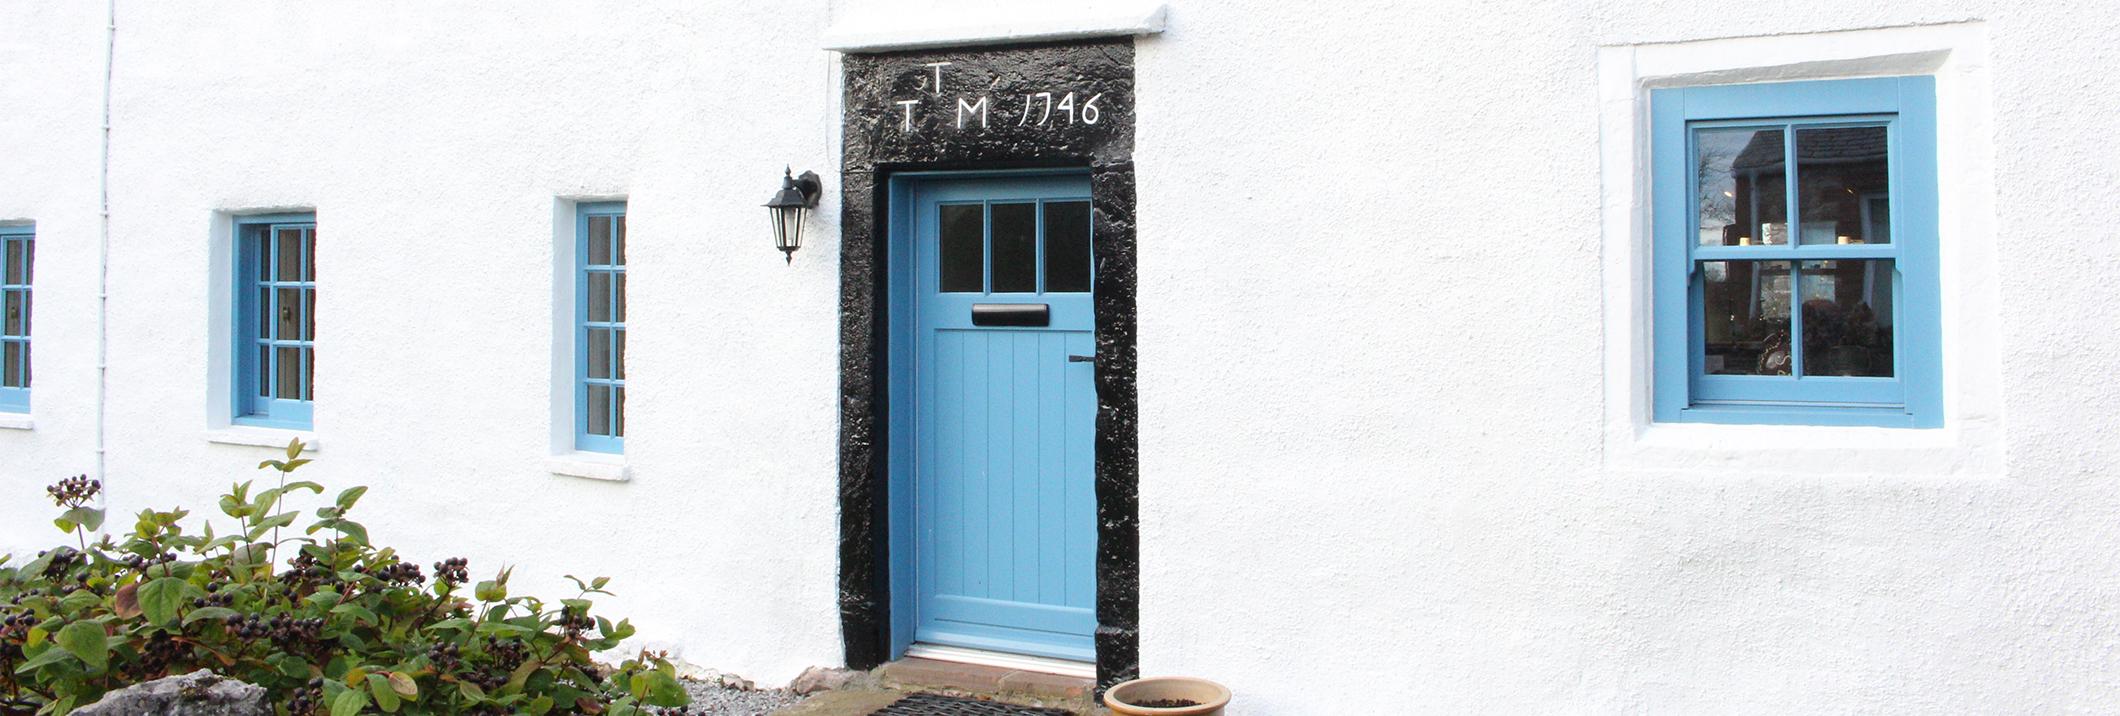 taylors farm listed building doors and windows by ajd chapelhow